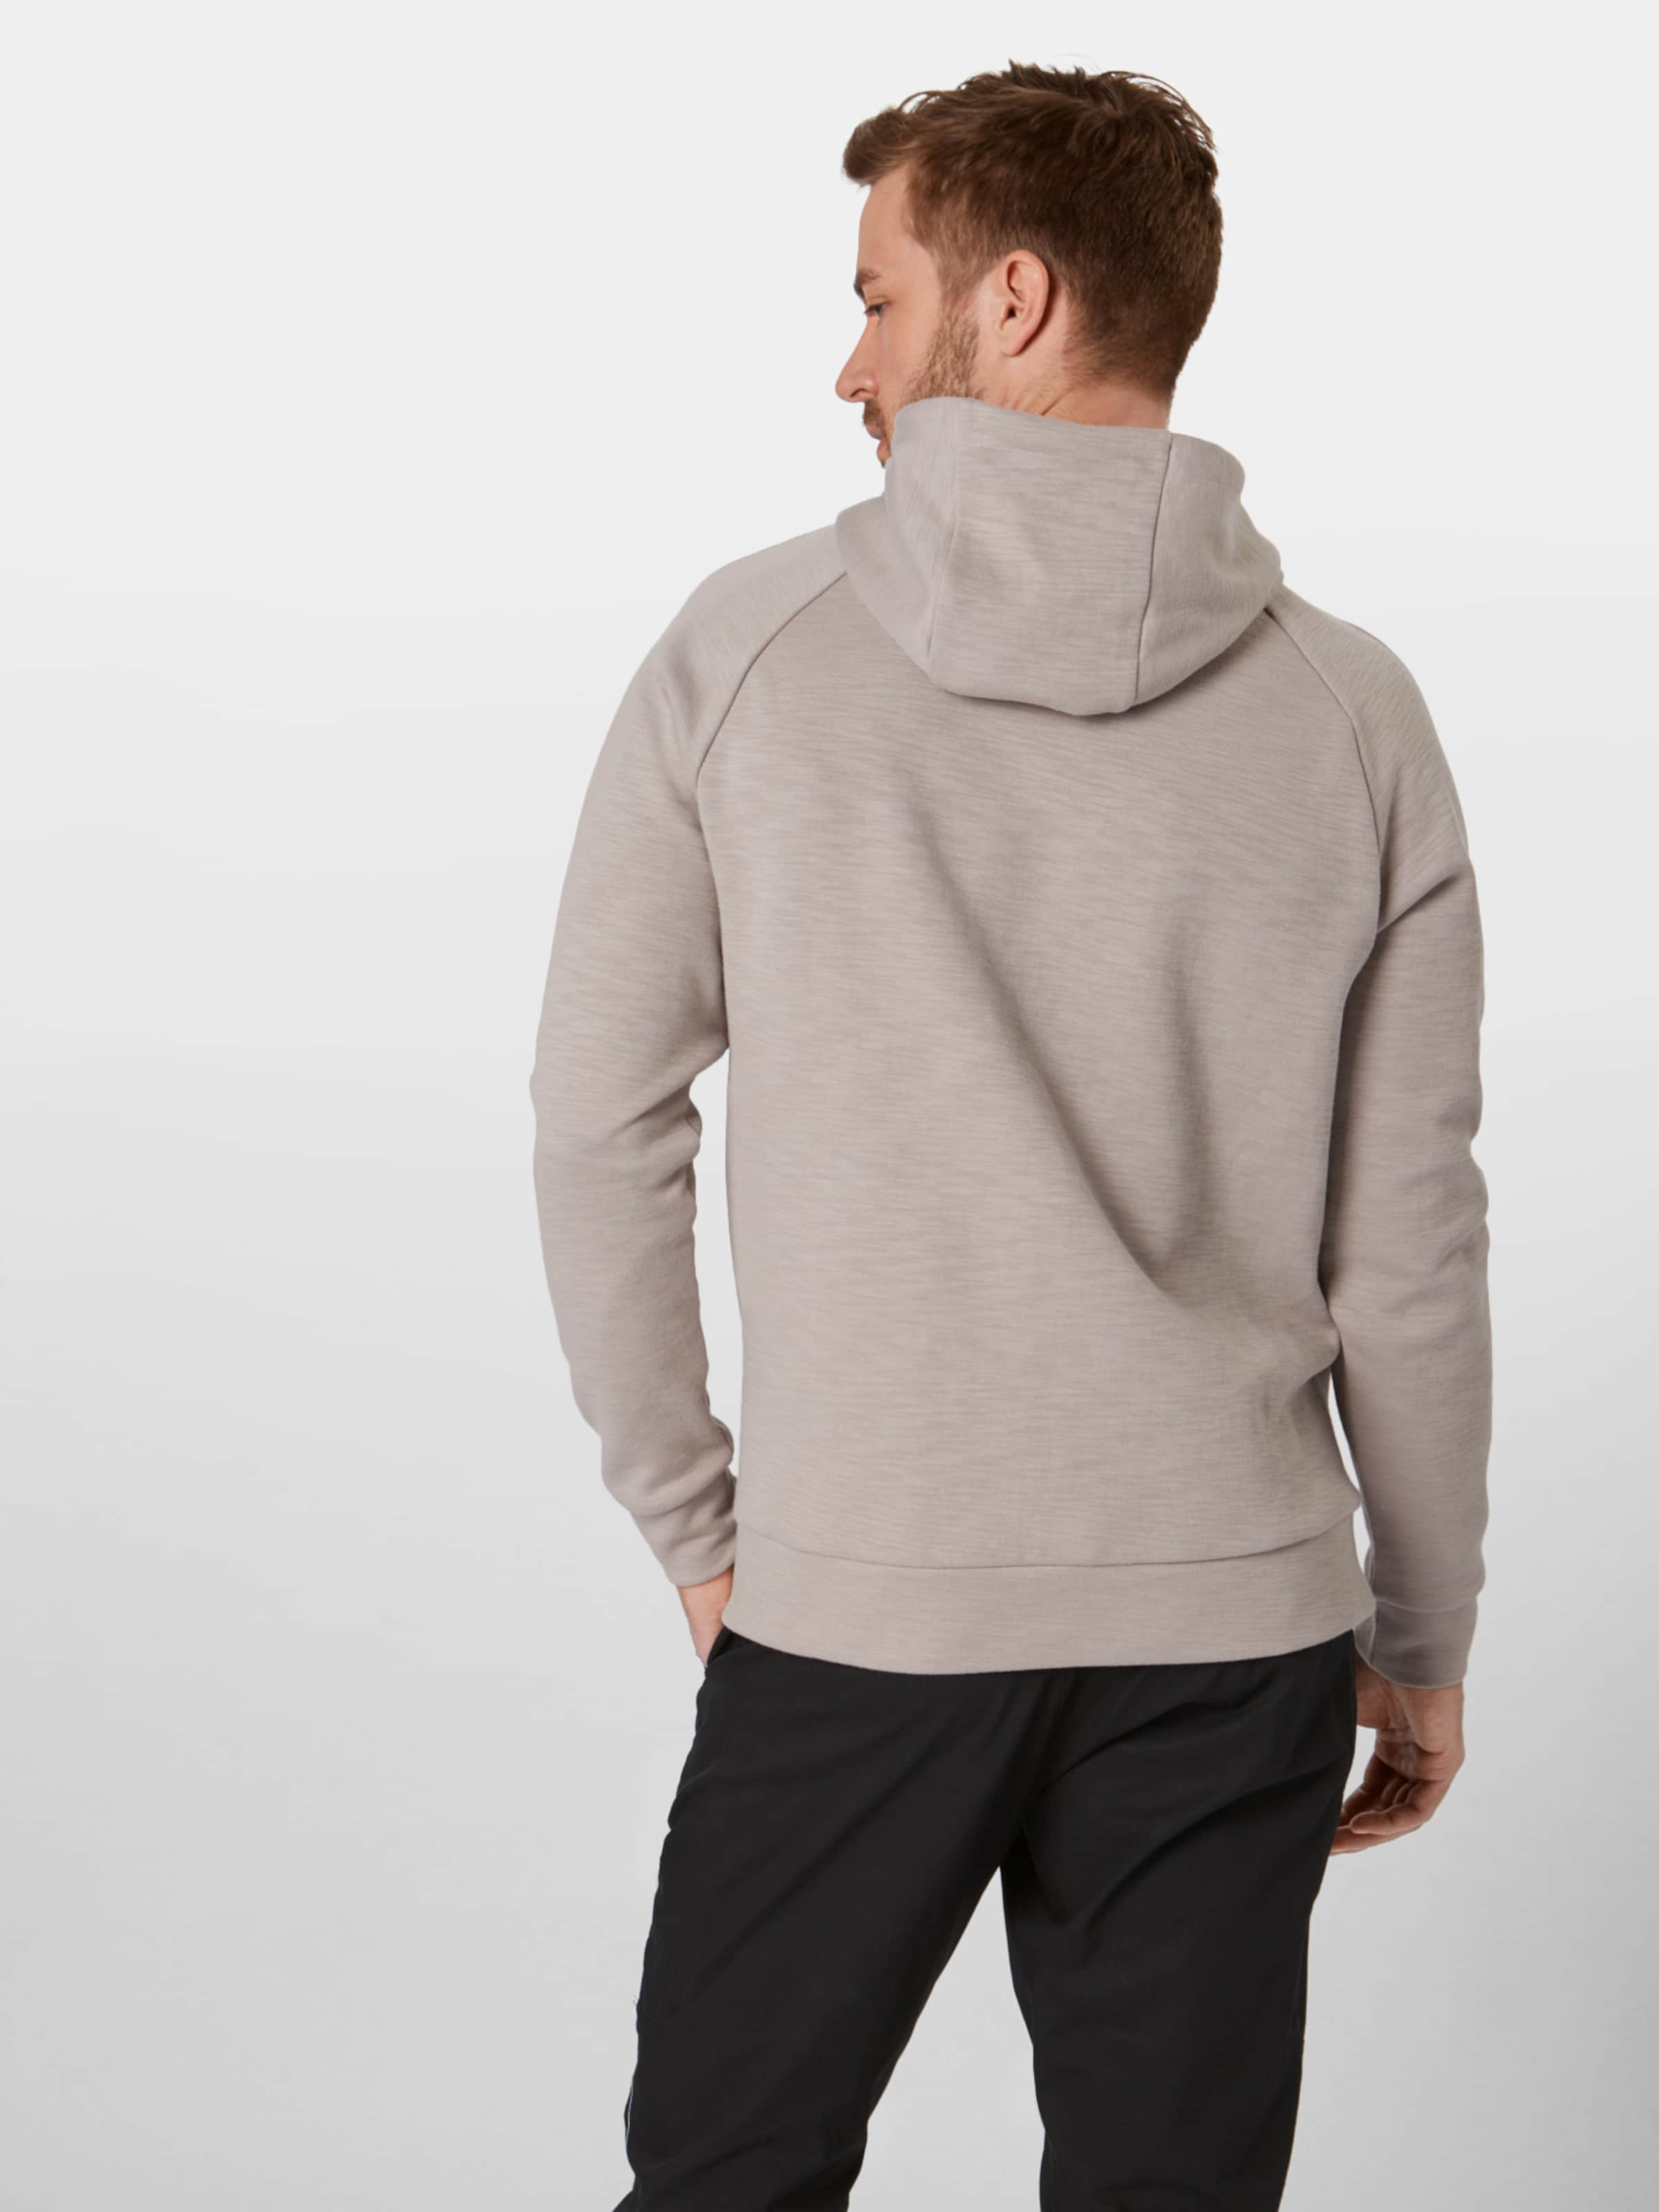 Po Sweatshirt Gx' Sportswear Hoodie Nike CremeSchwarz 'm In Nsw Optic N0w8nm